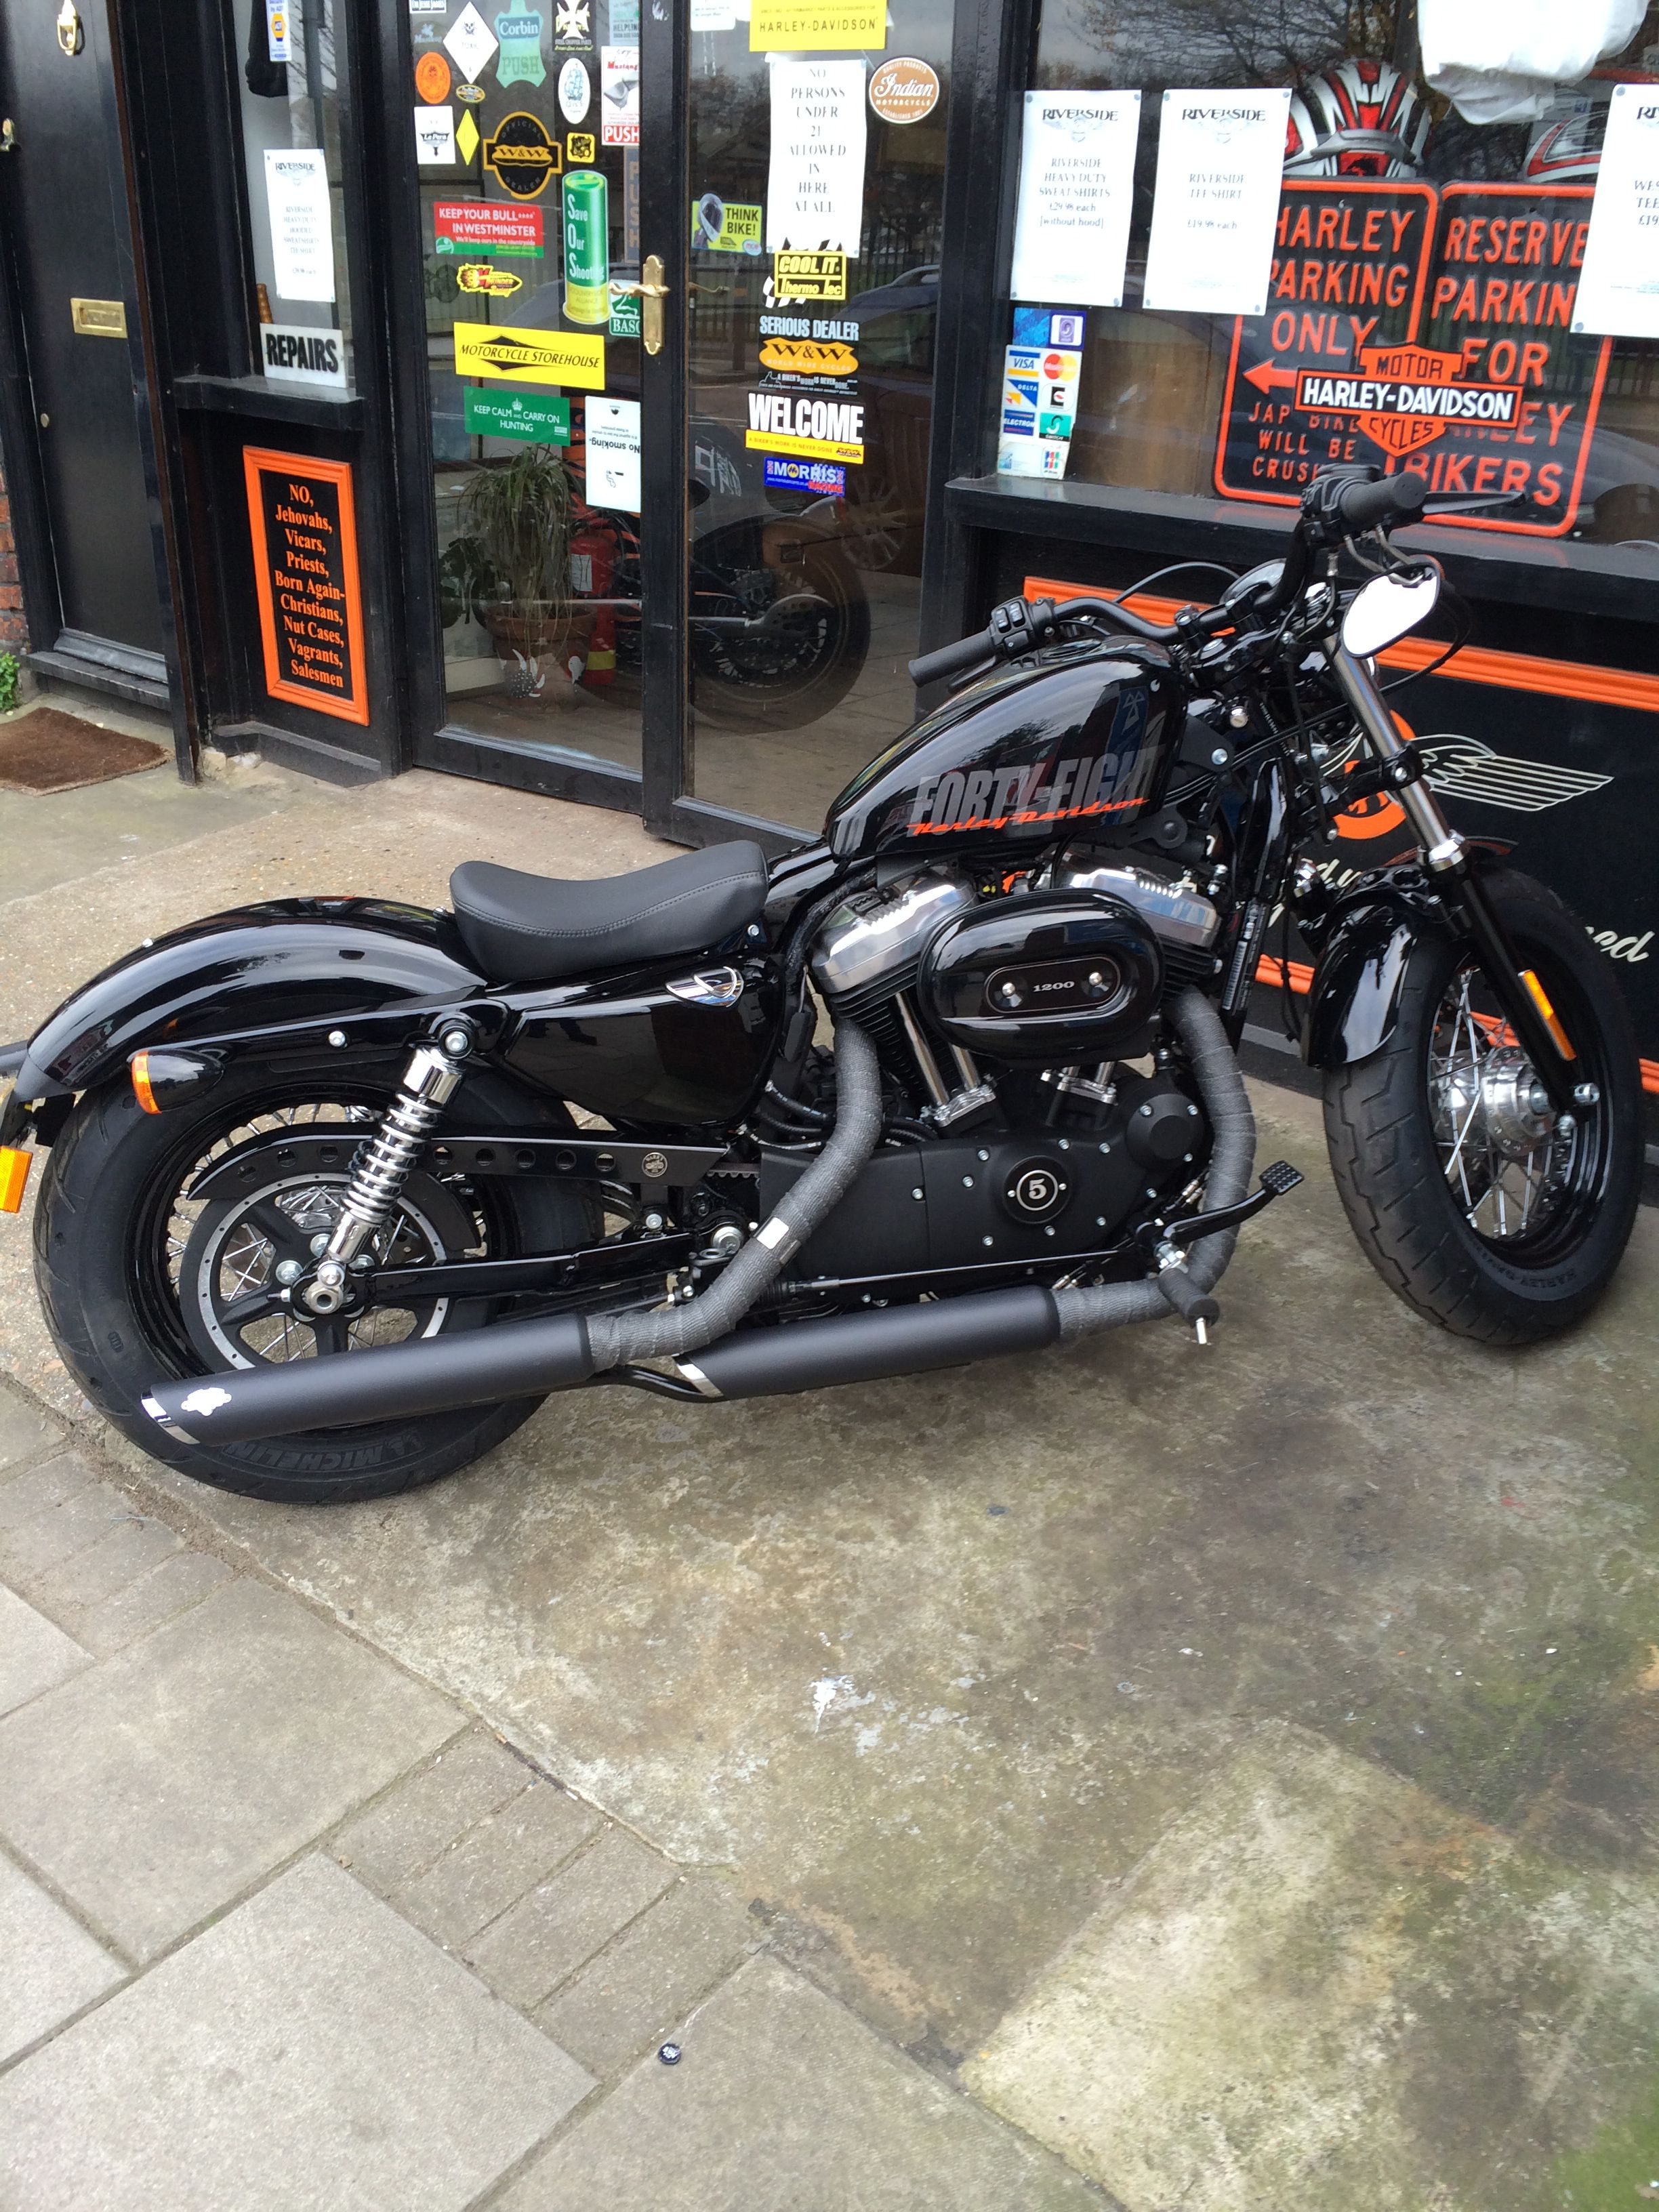 2014 Harley Davidson 48 with Vance & Hines slip ons